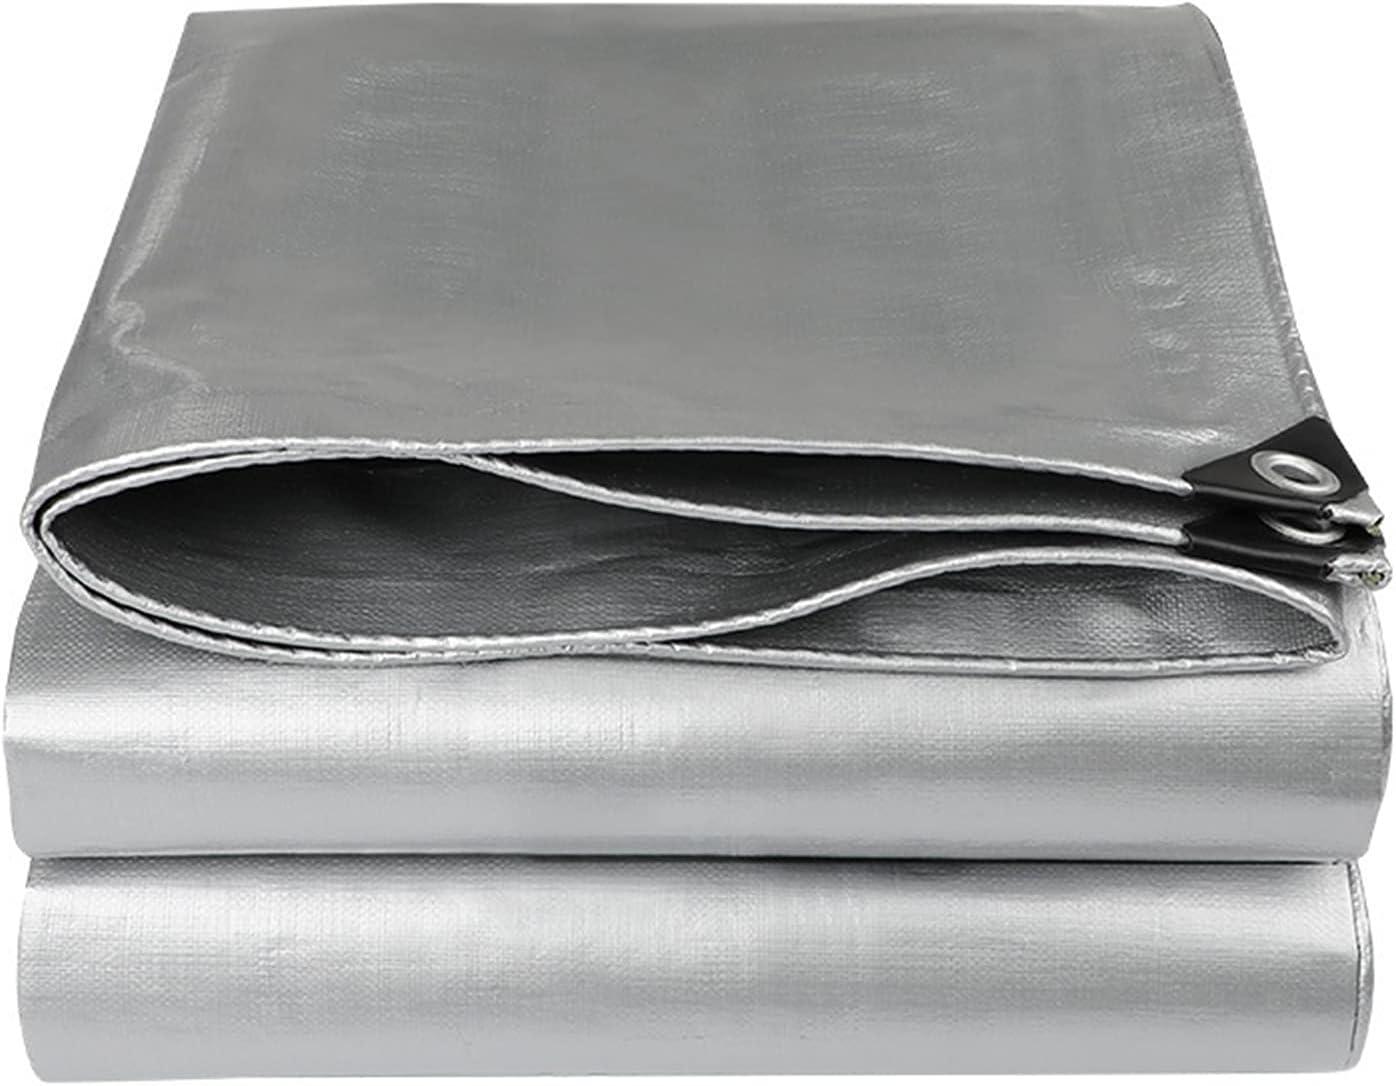 kengbi Lightweight But Durable Waterproo Max Mail order 75% OFF Multi-Purpose Tarp